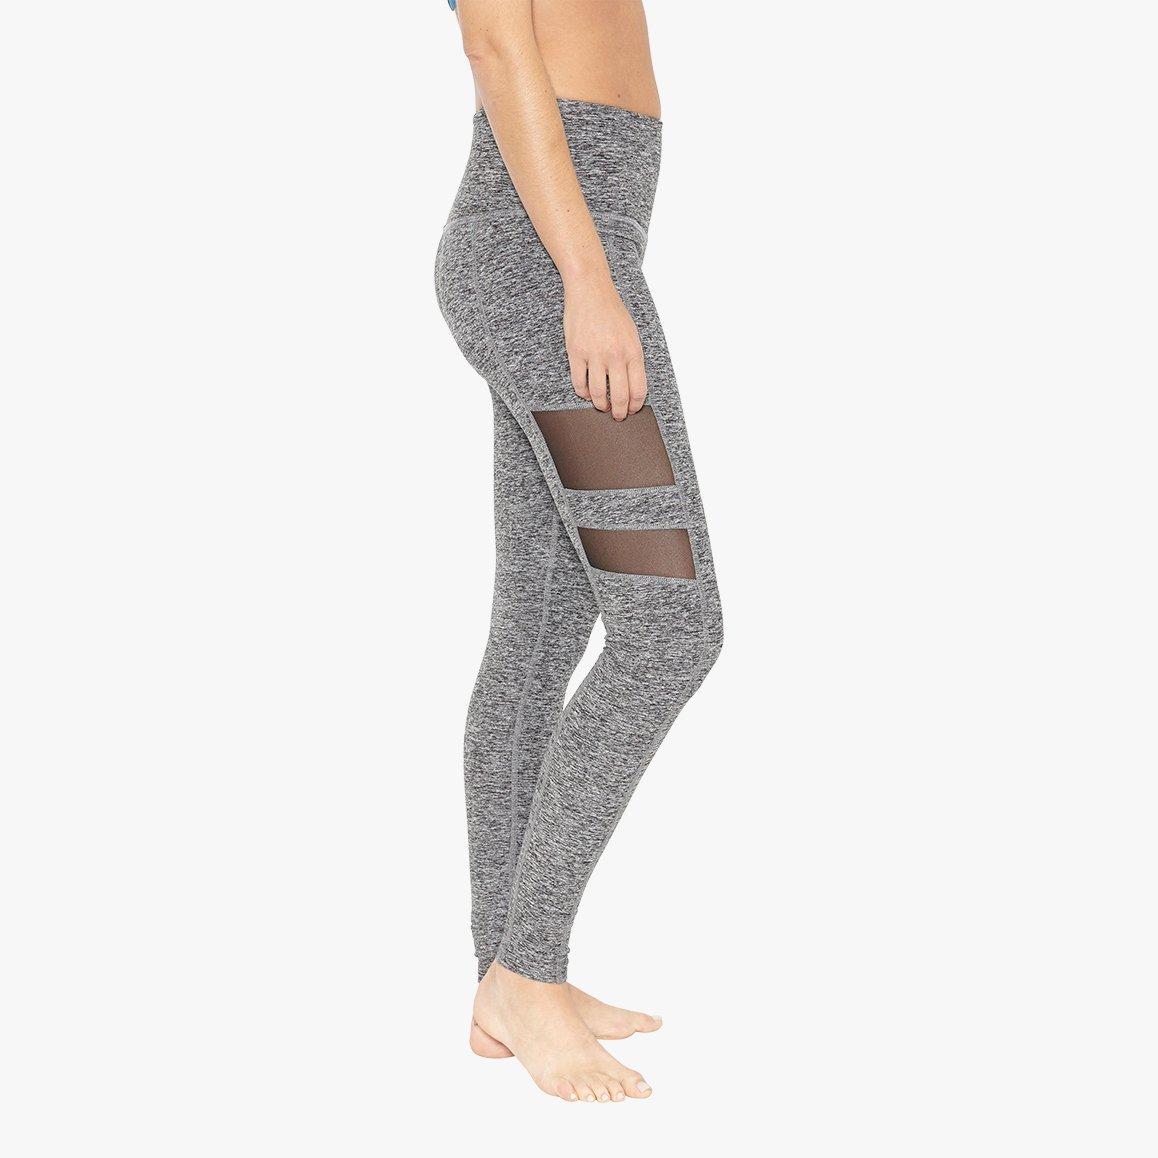 Beyond Yoga Spacedye Striped Mesh High Waist Midi Legging, Black-White Sd, X-Small